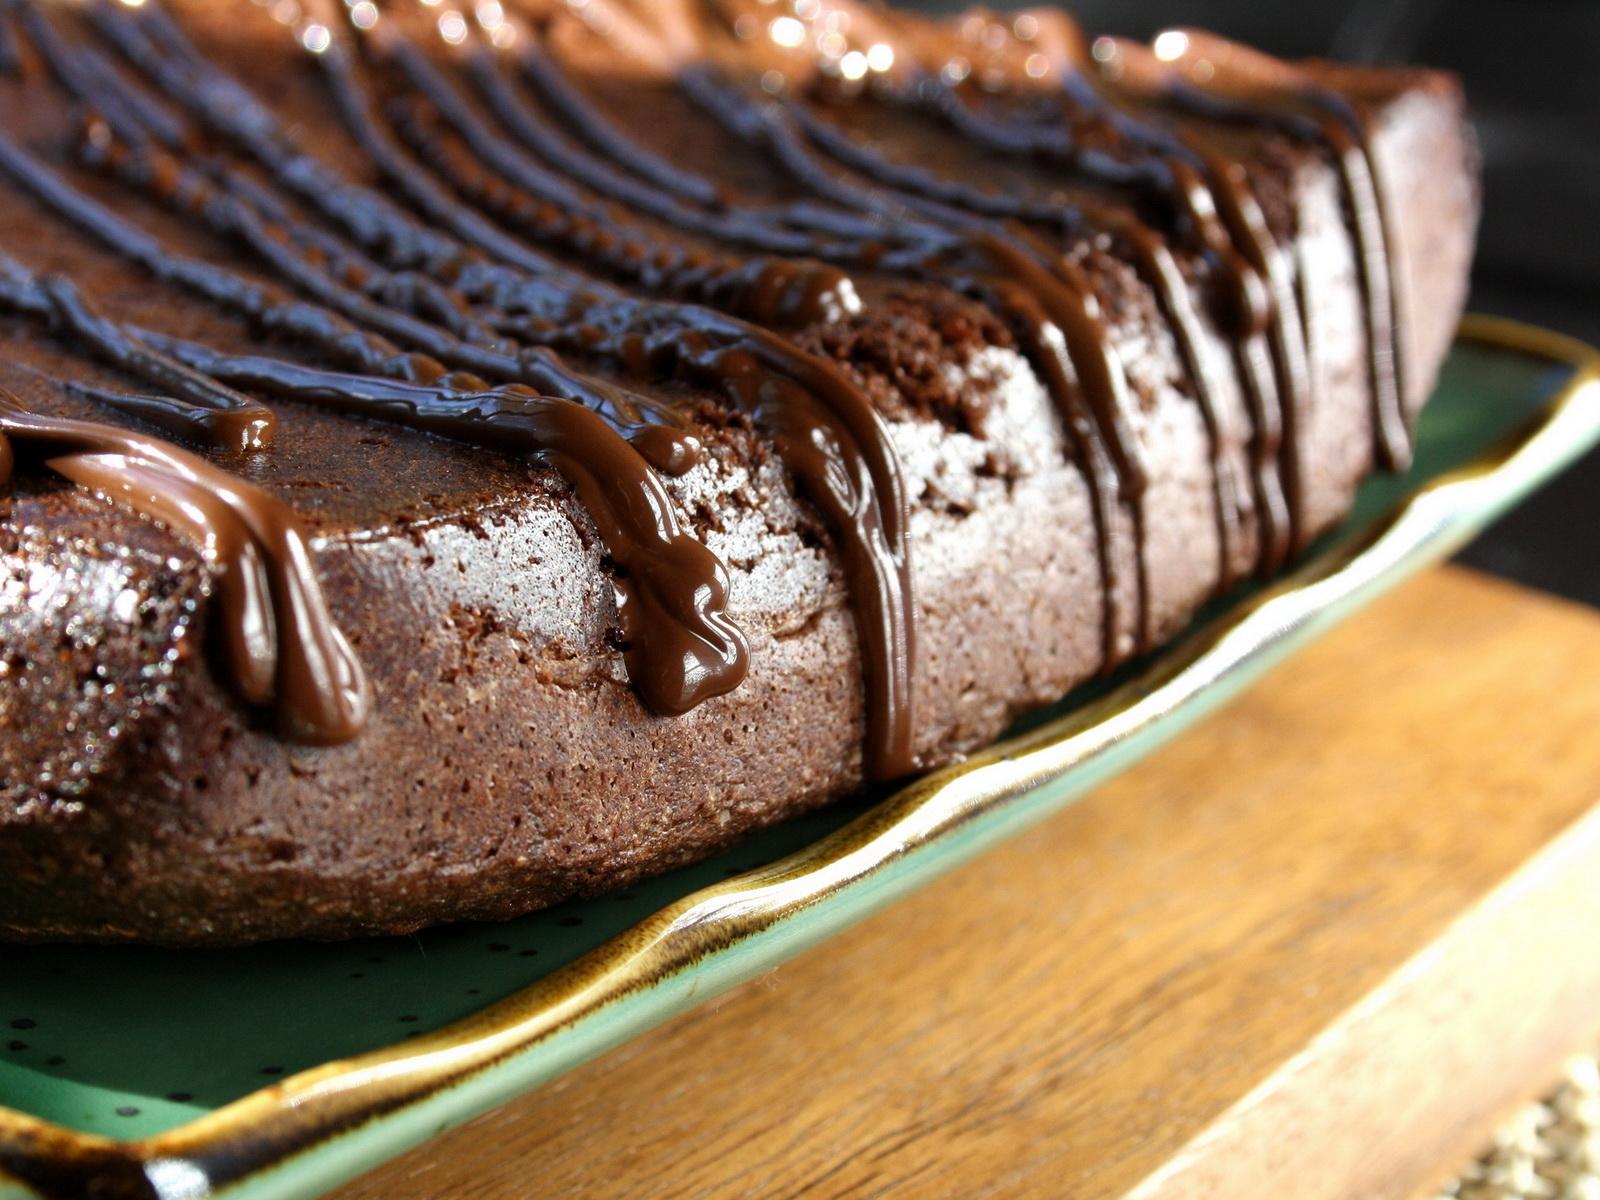 Chocolate cake Desktop wallpapers 1600x1200